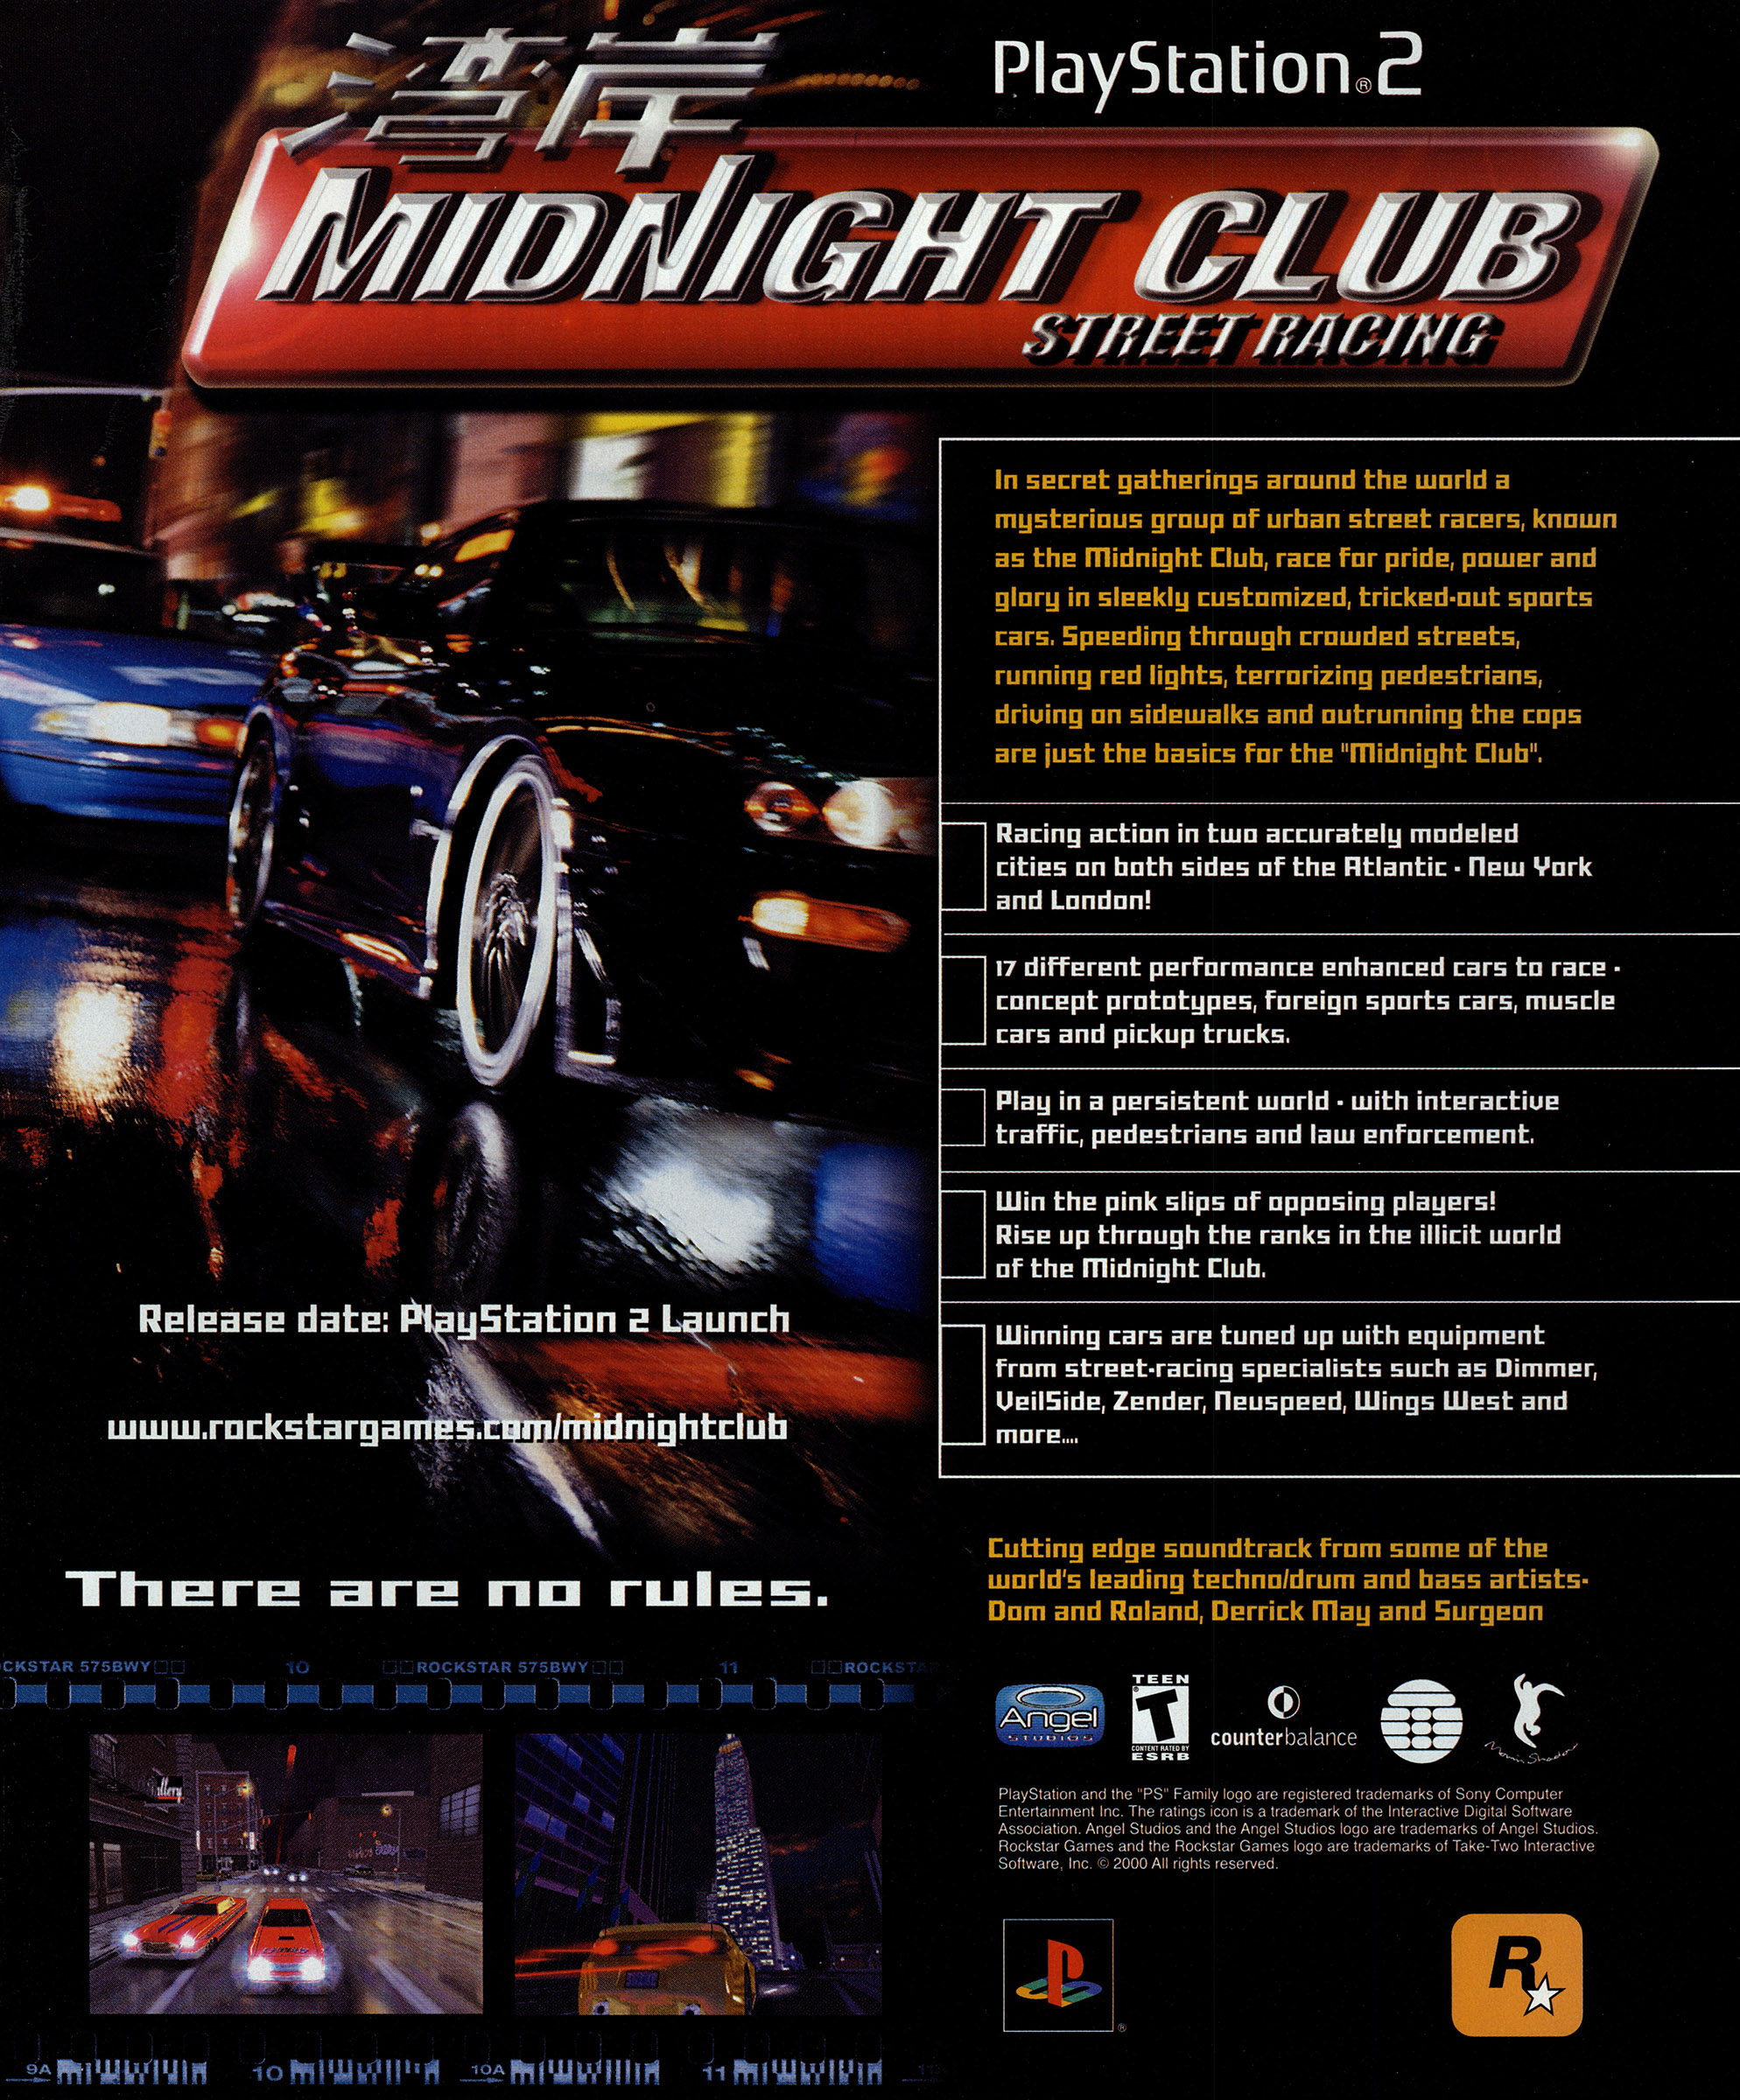 Midnight Club Street Racing Ntsc U Usa Advert Alternate Page 2